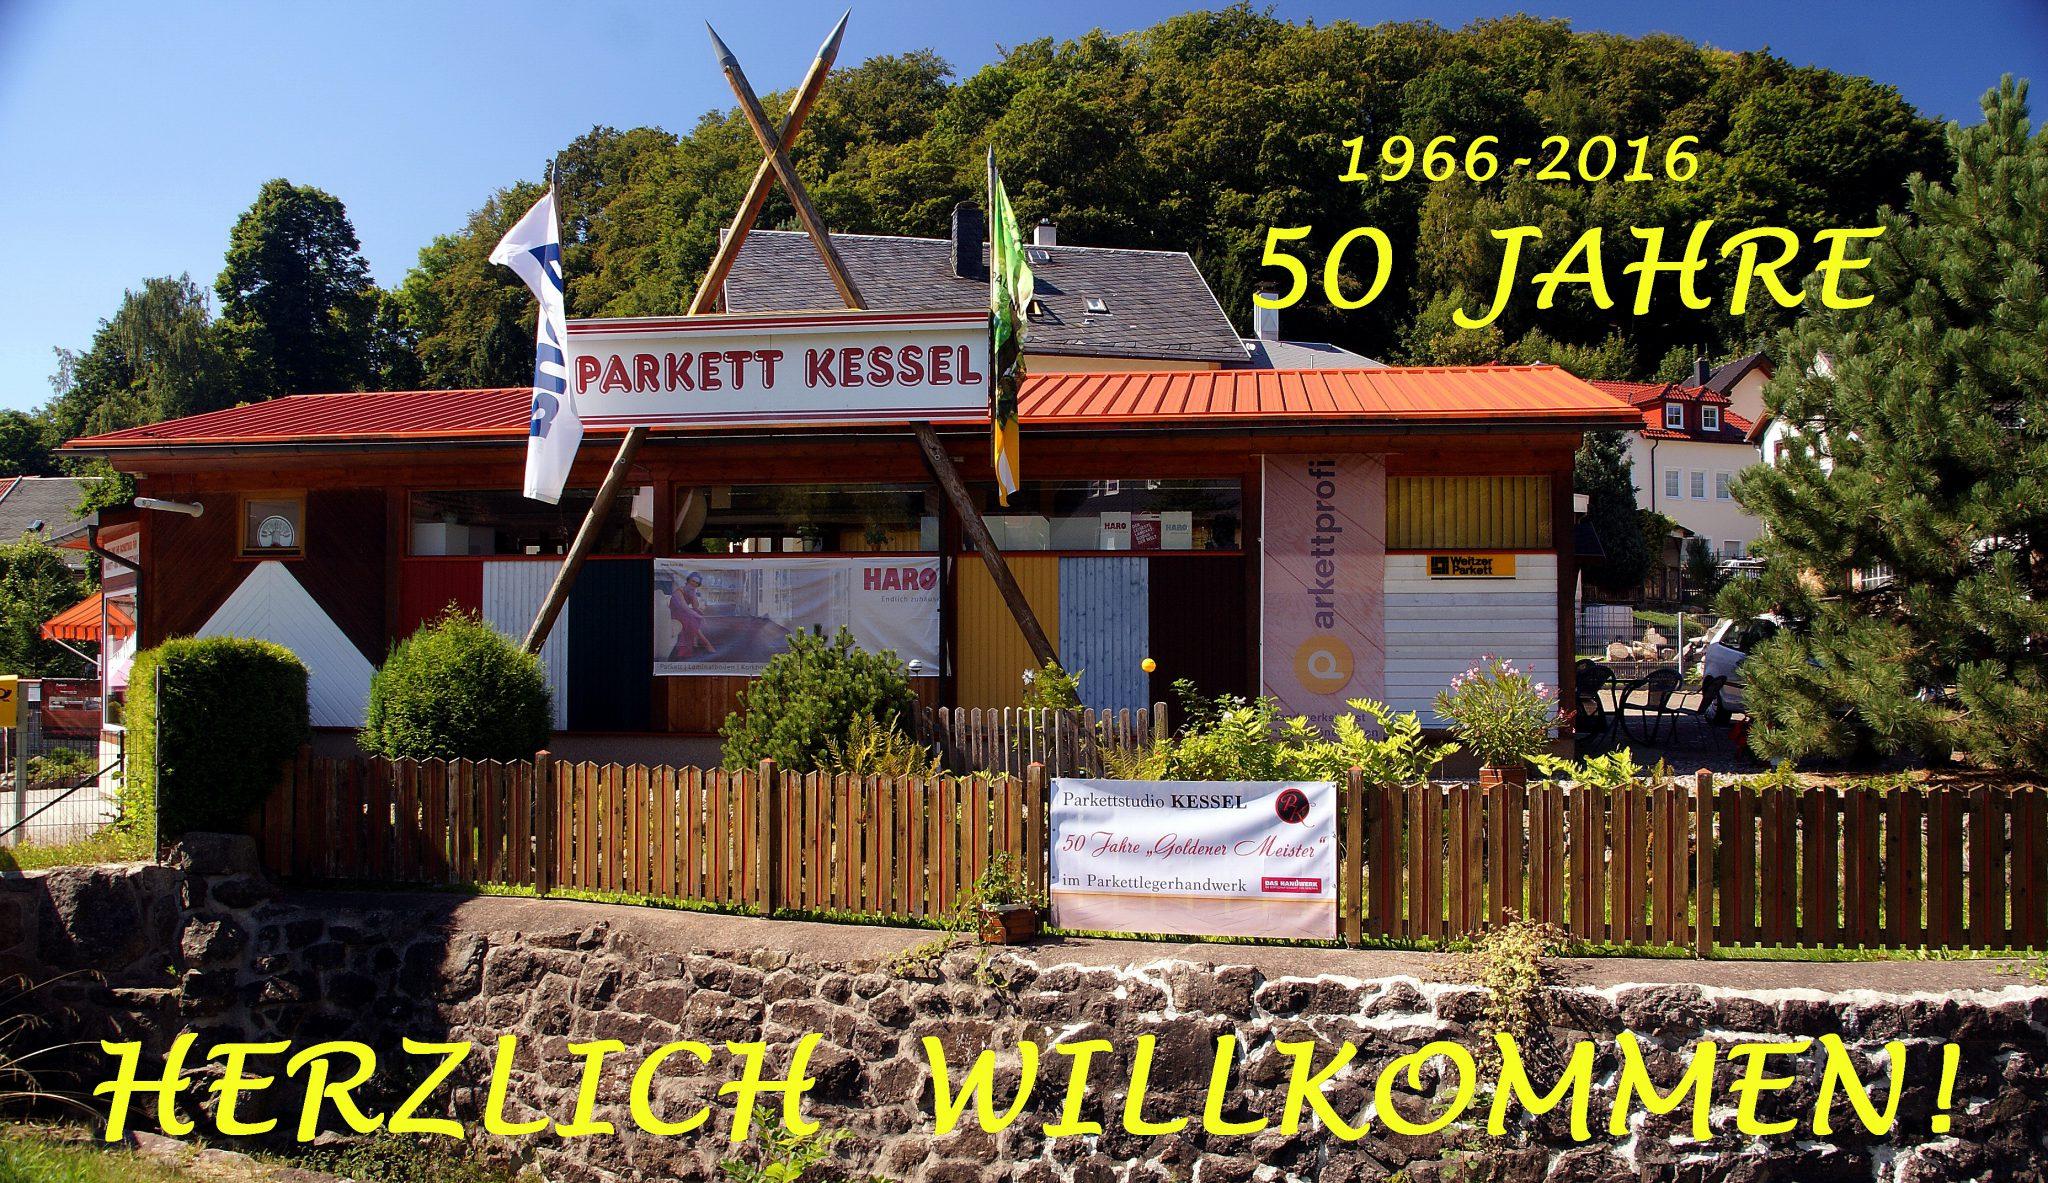 Rückschau: 50 Jahre Parkett Kessel 1966-2016